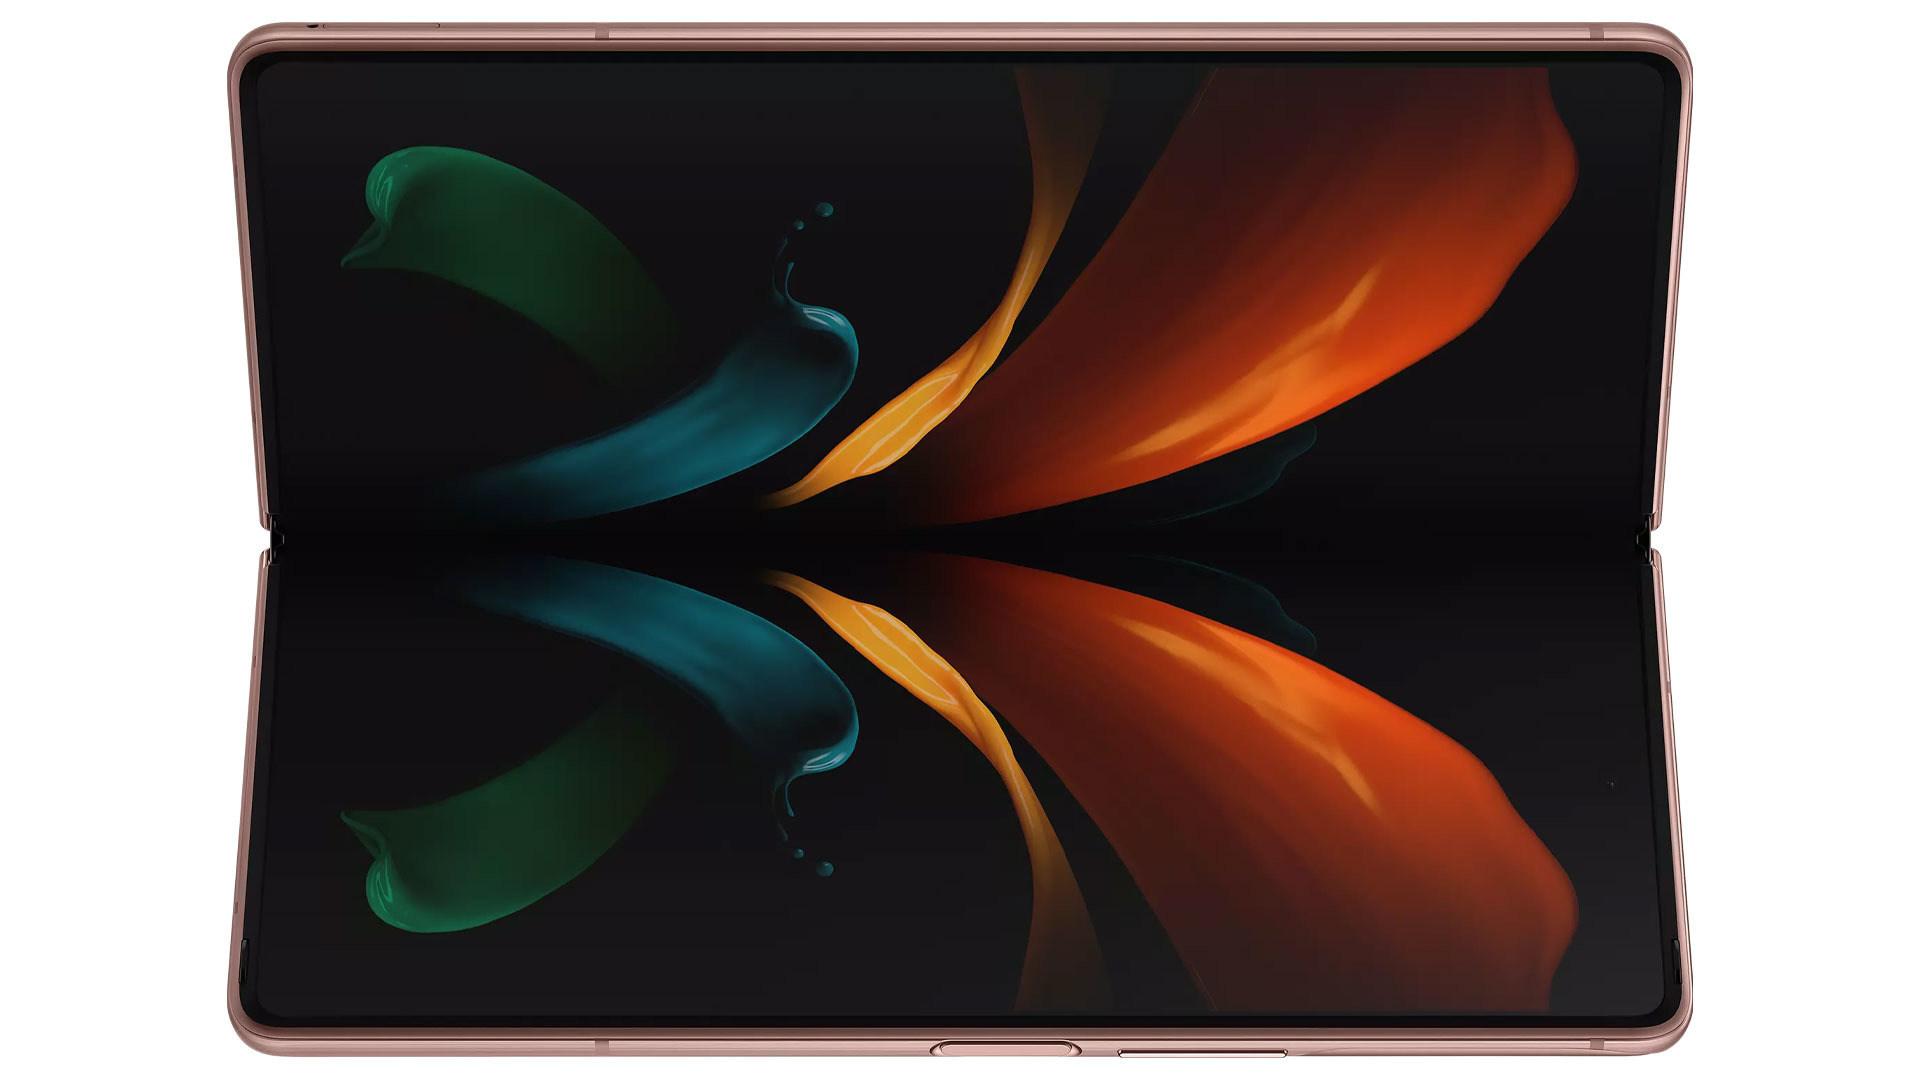 Smartphone, Samsung, Display, Galaxy, faltbar, Faltbares Display, Faltbares Smartphone, foldable, Samsung Galaxy Z Fold 2 5G, Fold